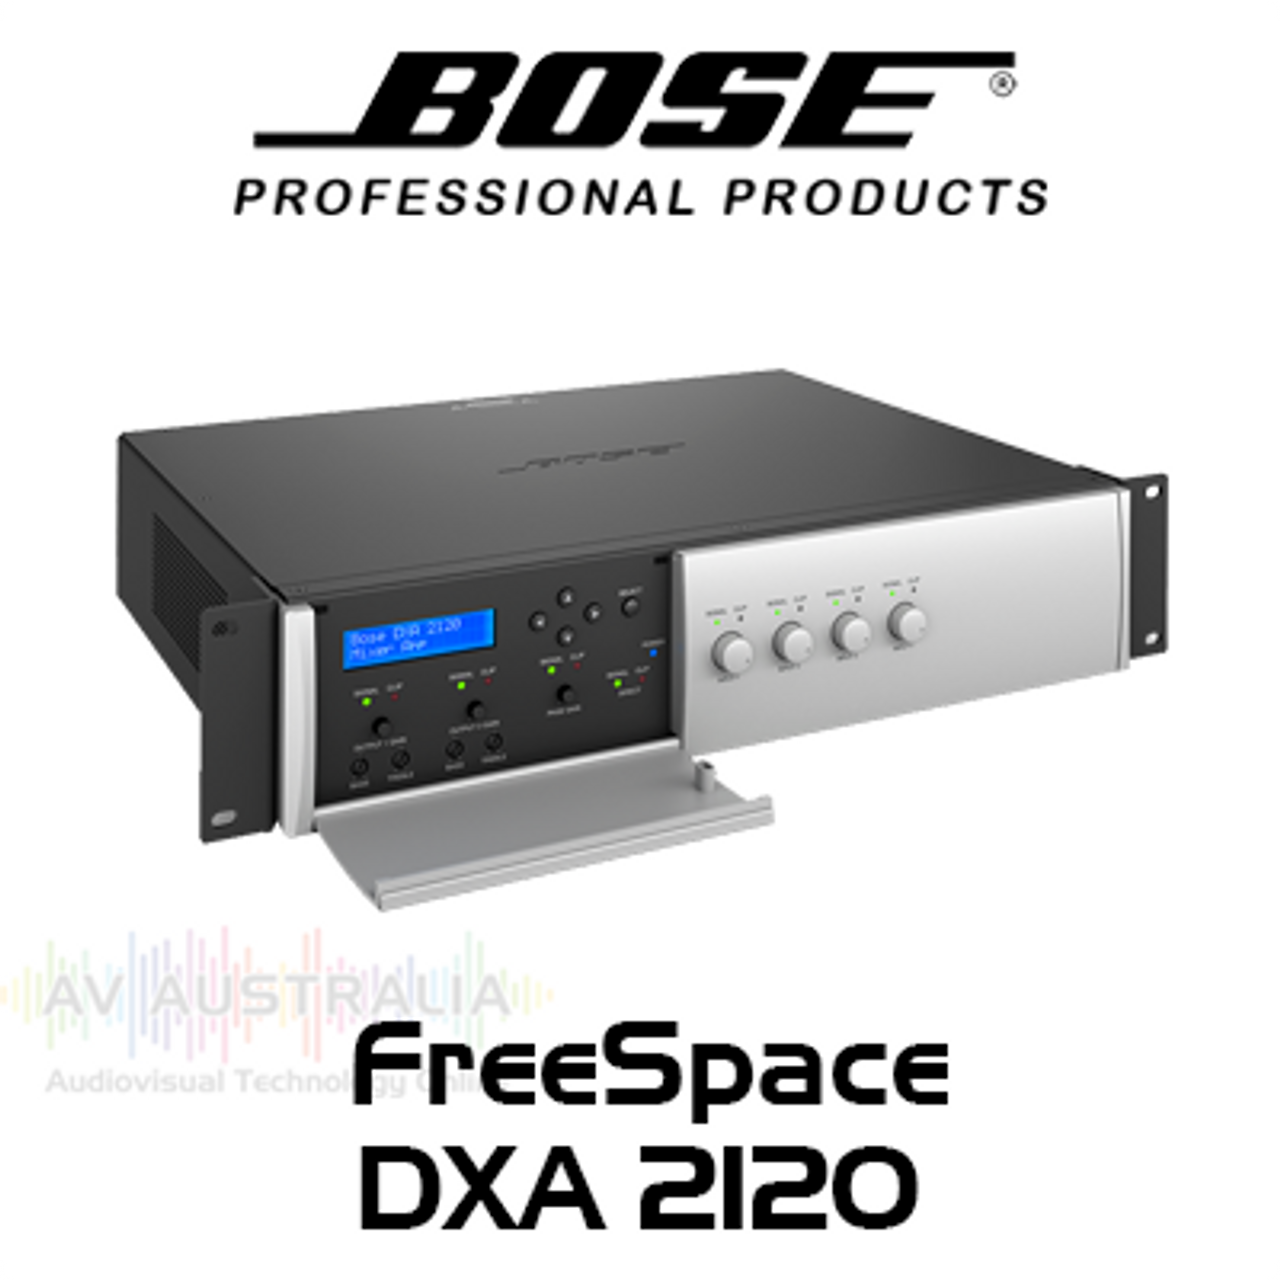 Bose Pro FreeSpace DXA2120 Digital Mixer / Amplifier